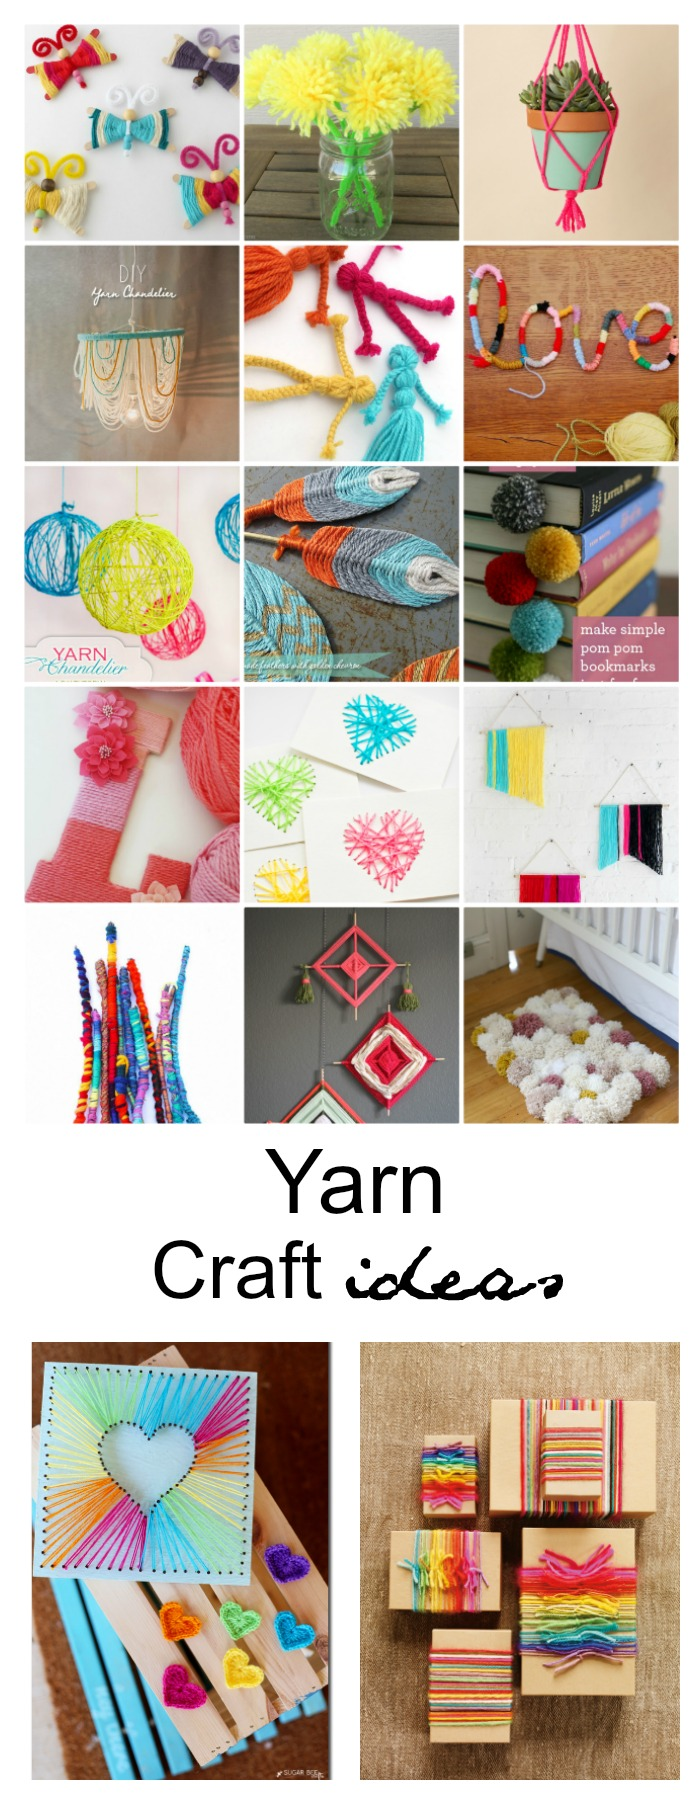 Yarn-Craft-Ideas-Pin